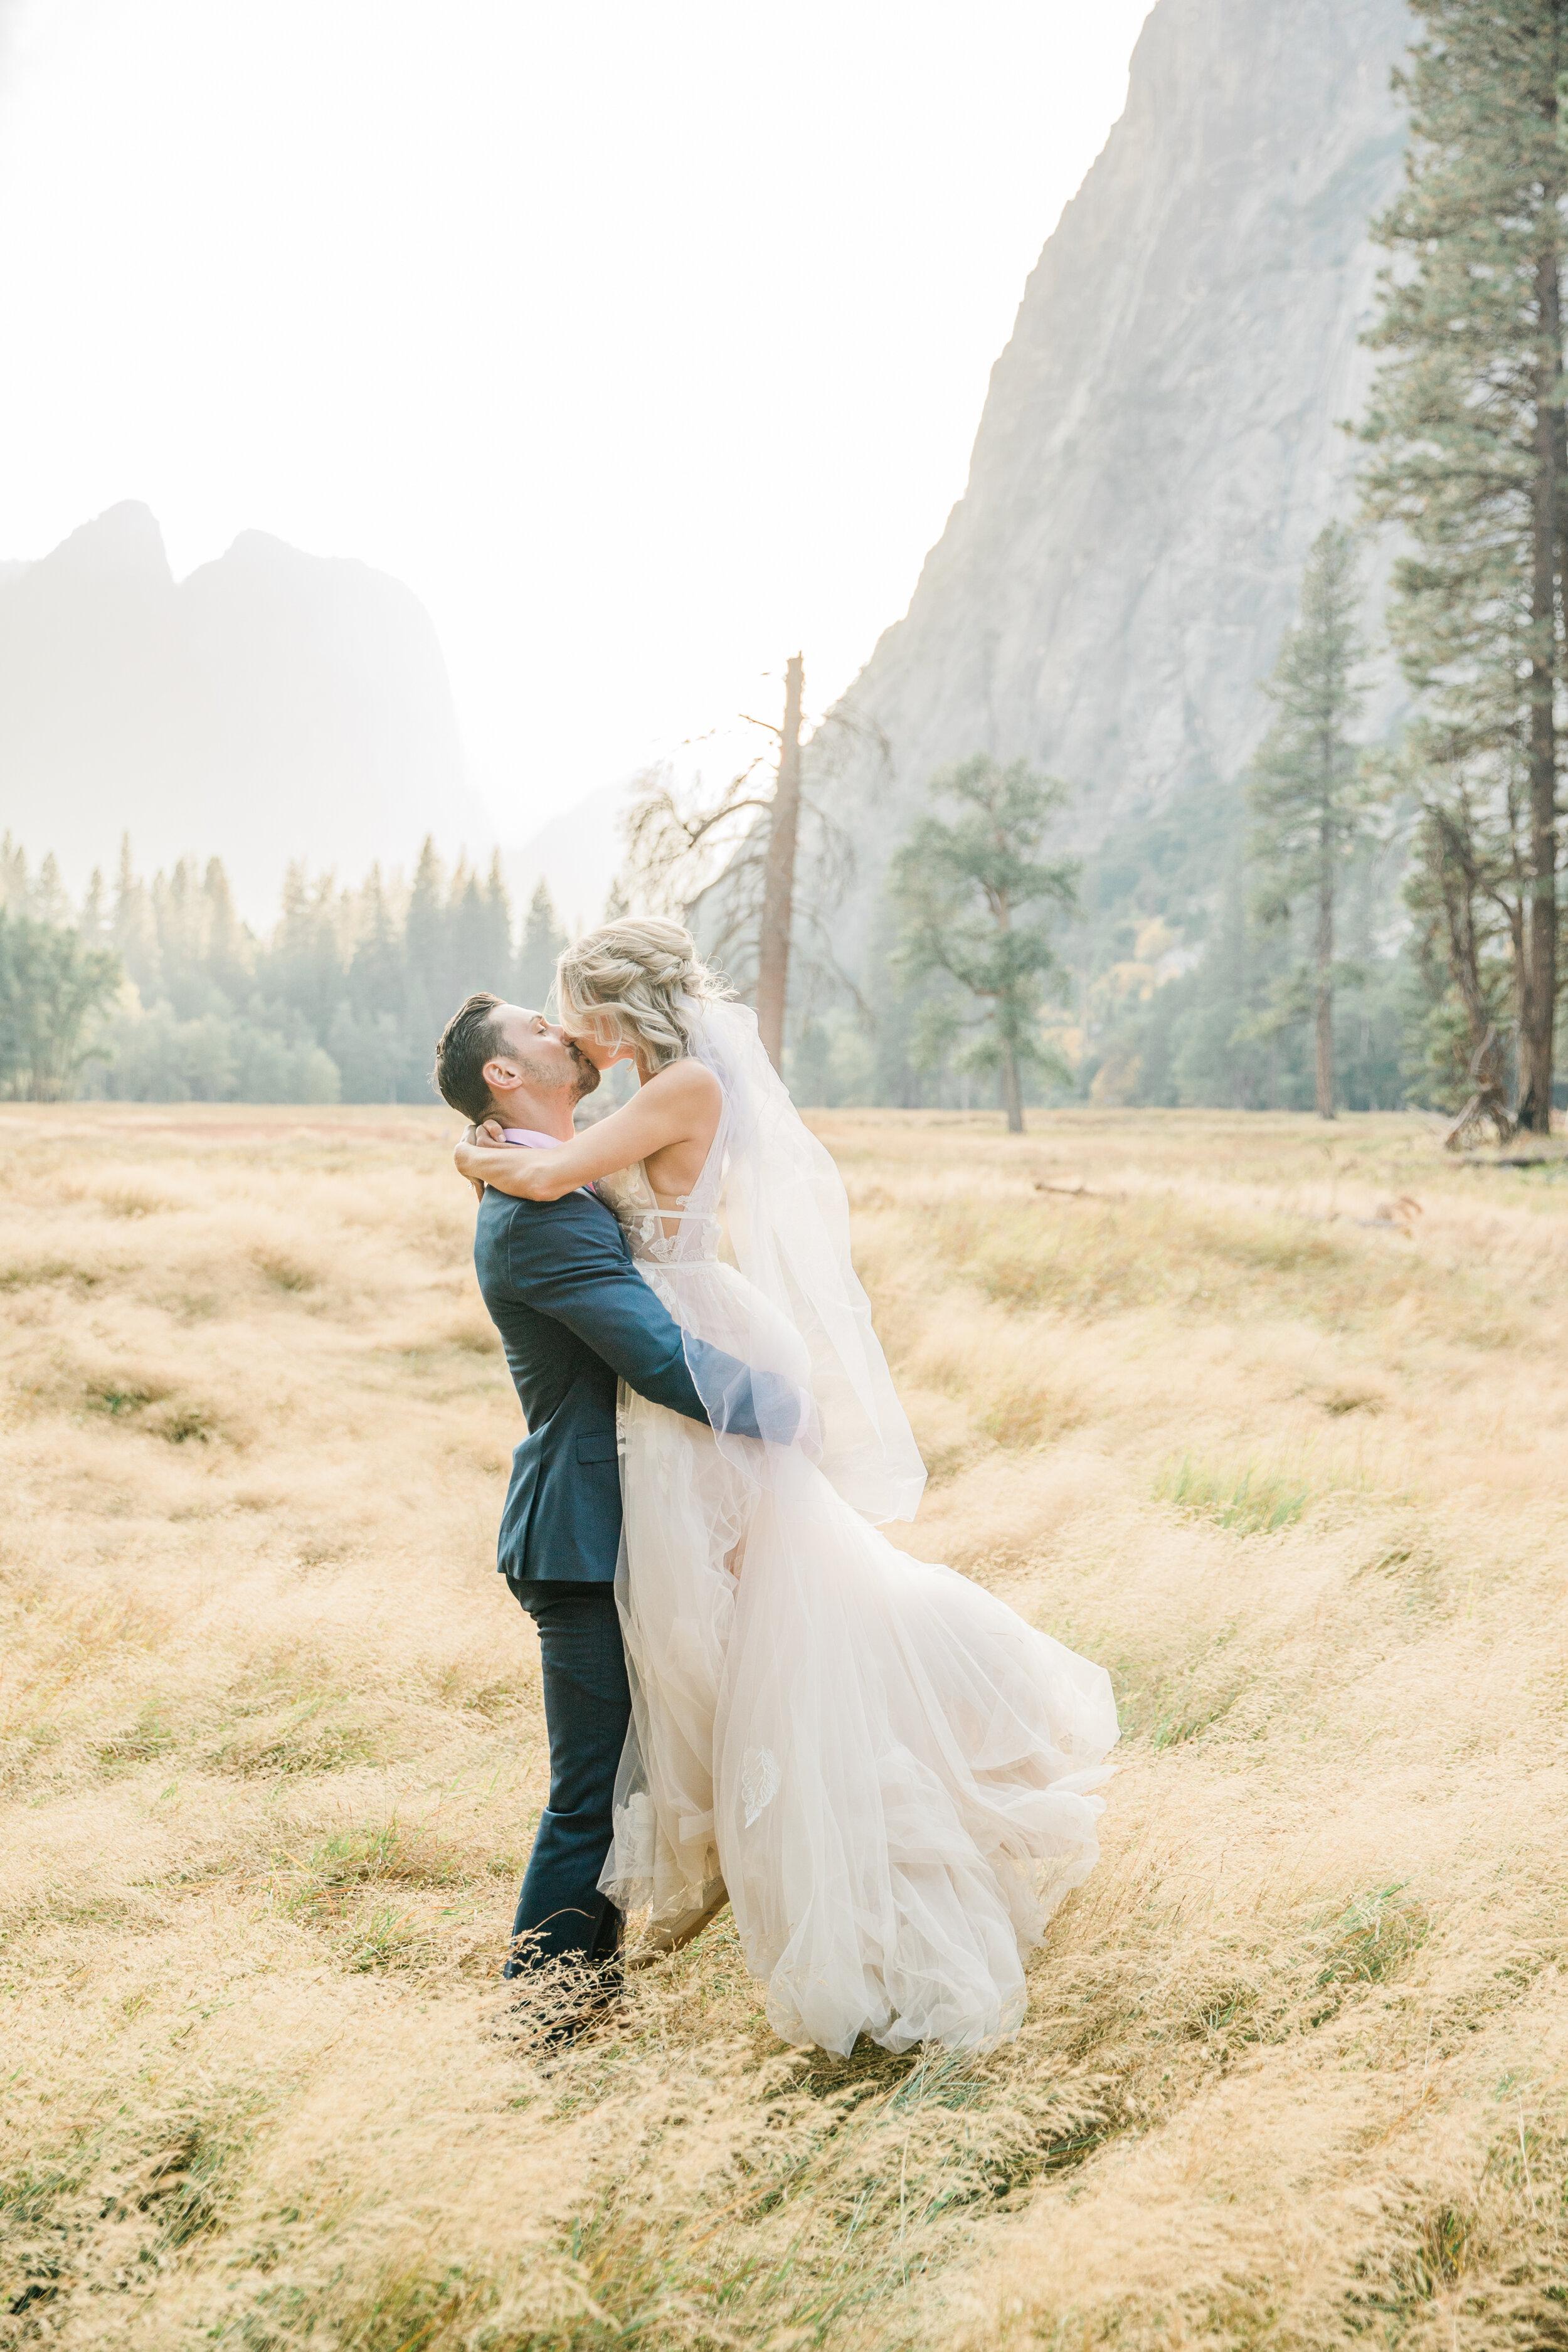 Leanne and Joe - Married - Sneak Peeks - Lauren Alisse Photography-39.jpg